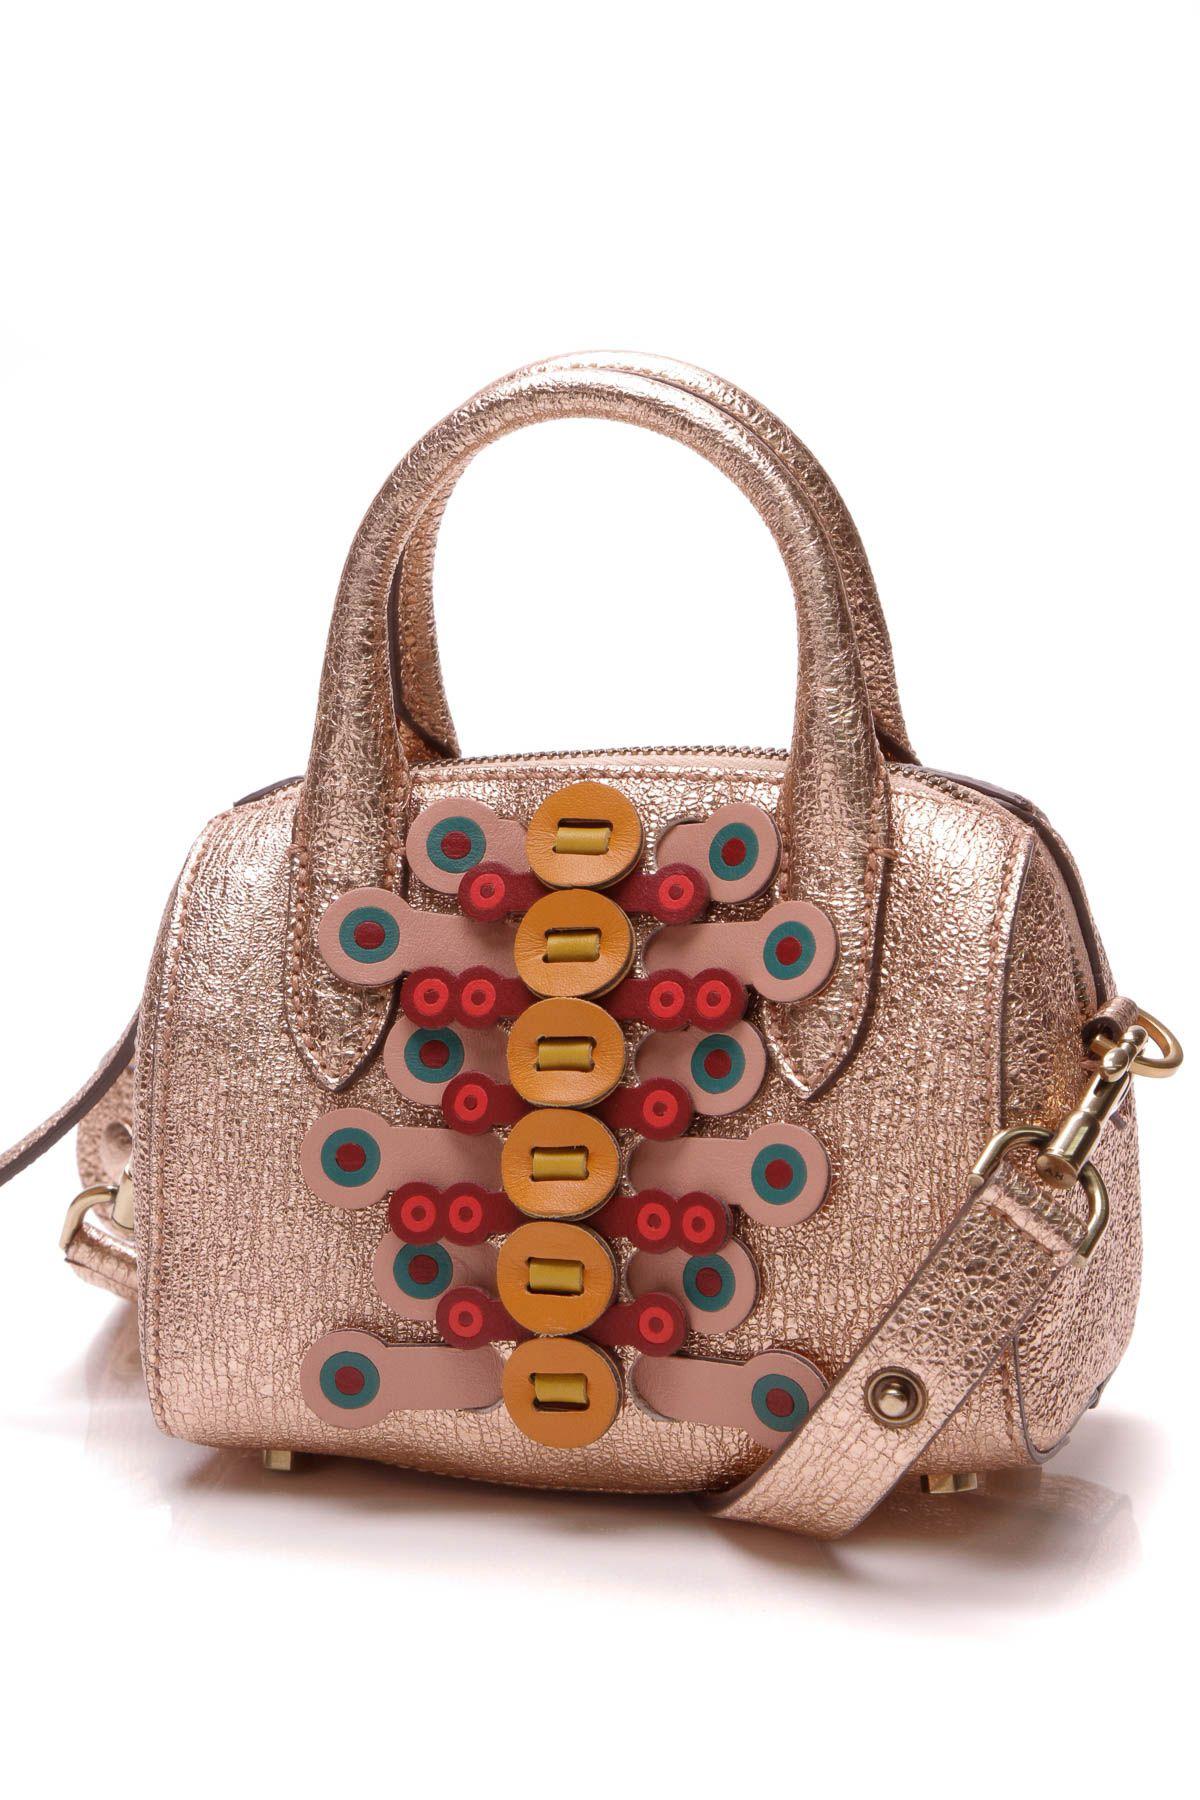 17168e5368d Anya Hindmarch Vere Mini Barrel Flip Shoulder Bag   In The Bag in ...